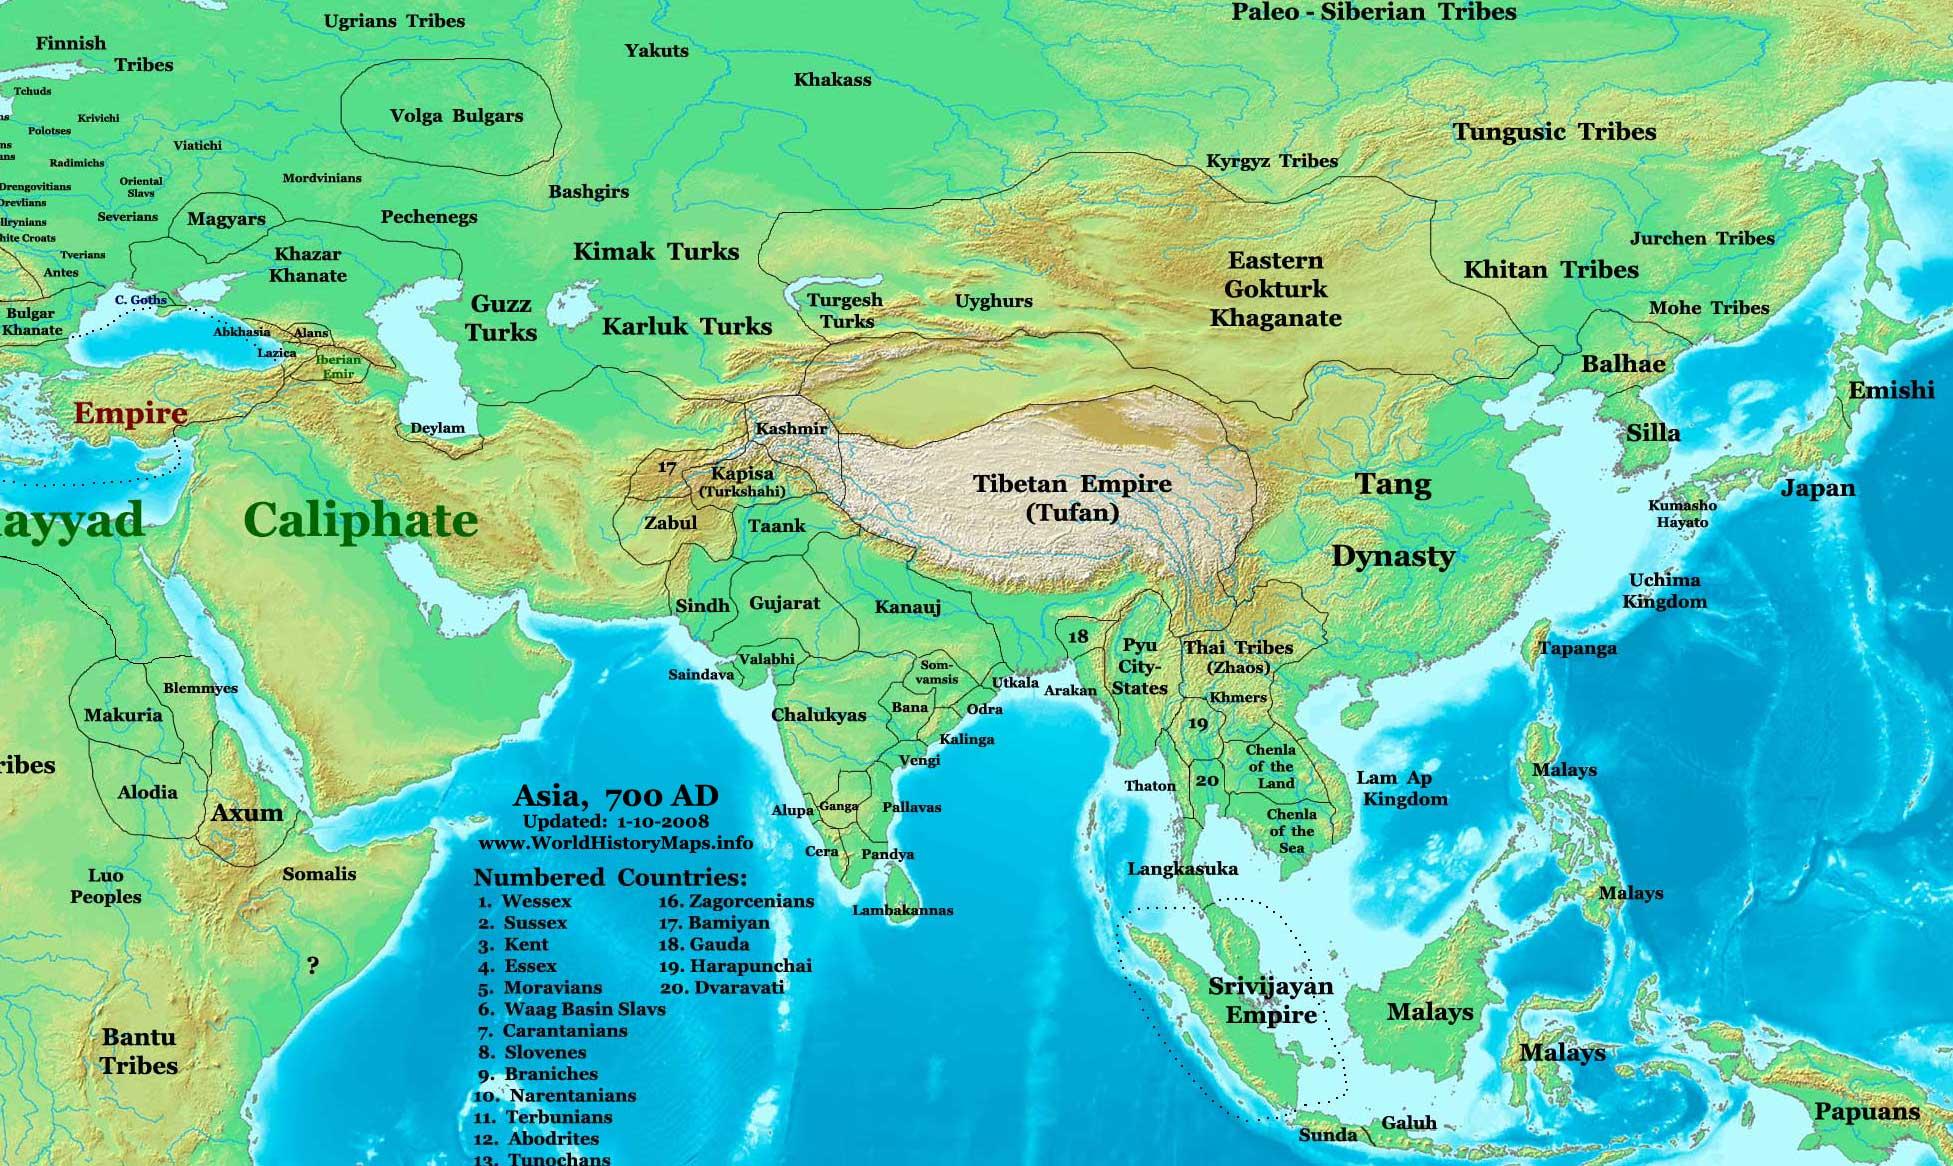 https://i2.wp.com/upload.wikimedia.org/wikipedia/commons/9/9c/Asia_700ad.jpg